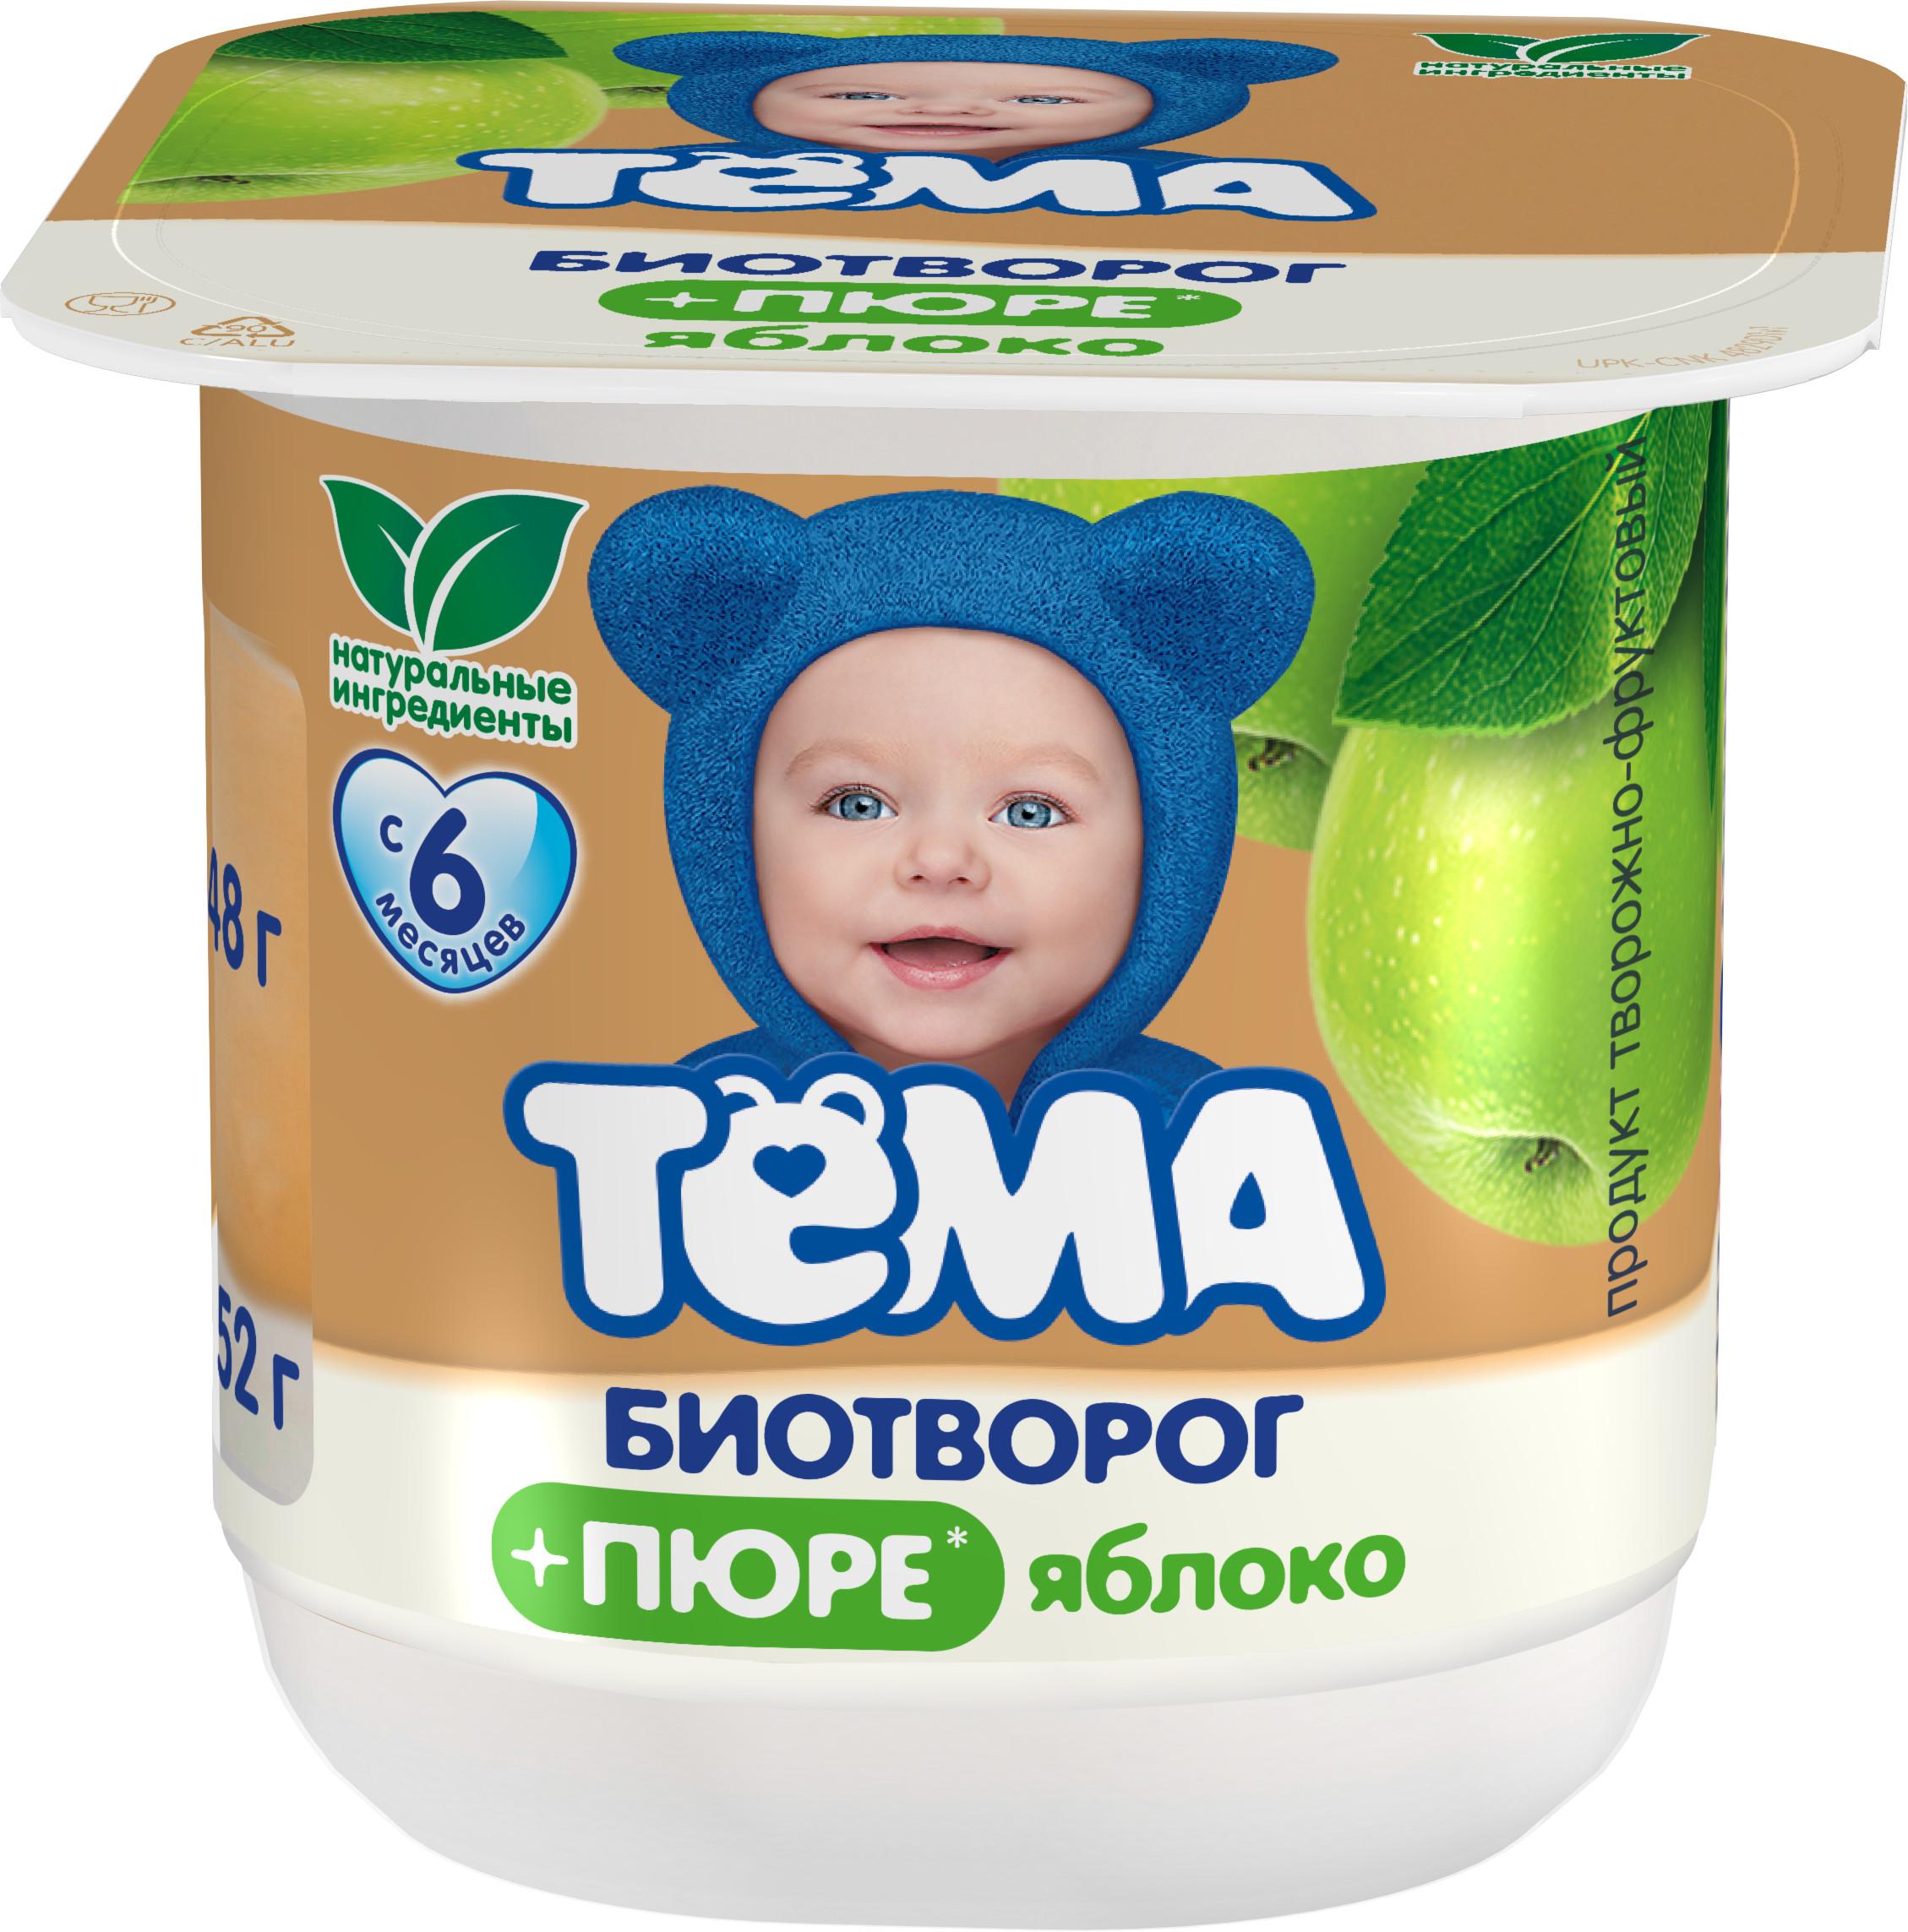 Биотворог Тёма с яблочным пюре 2,5% 6 мес. 100 г